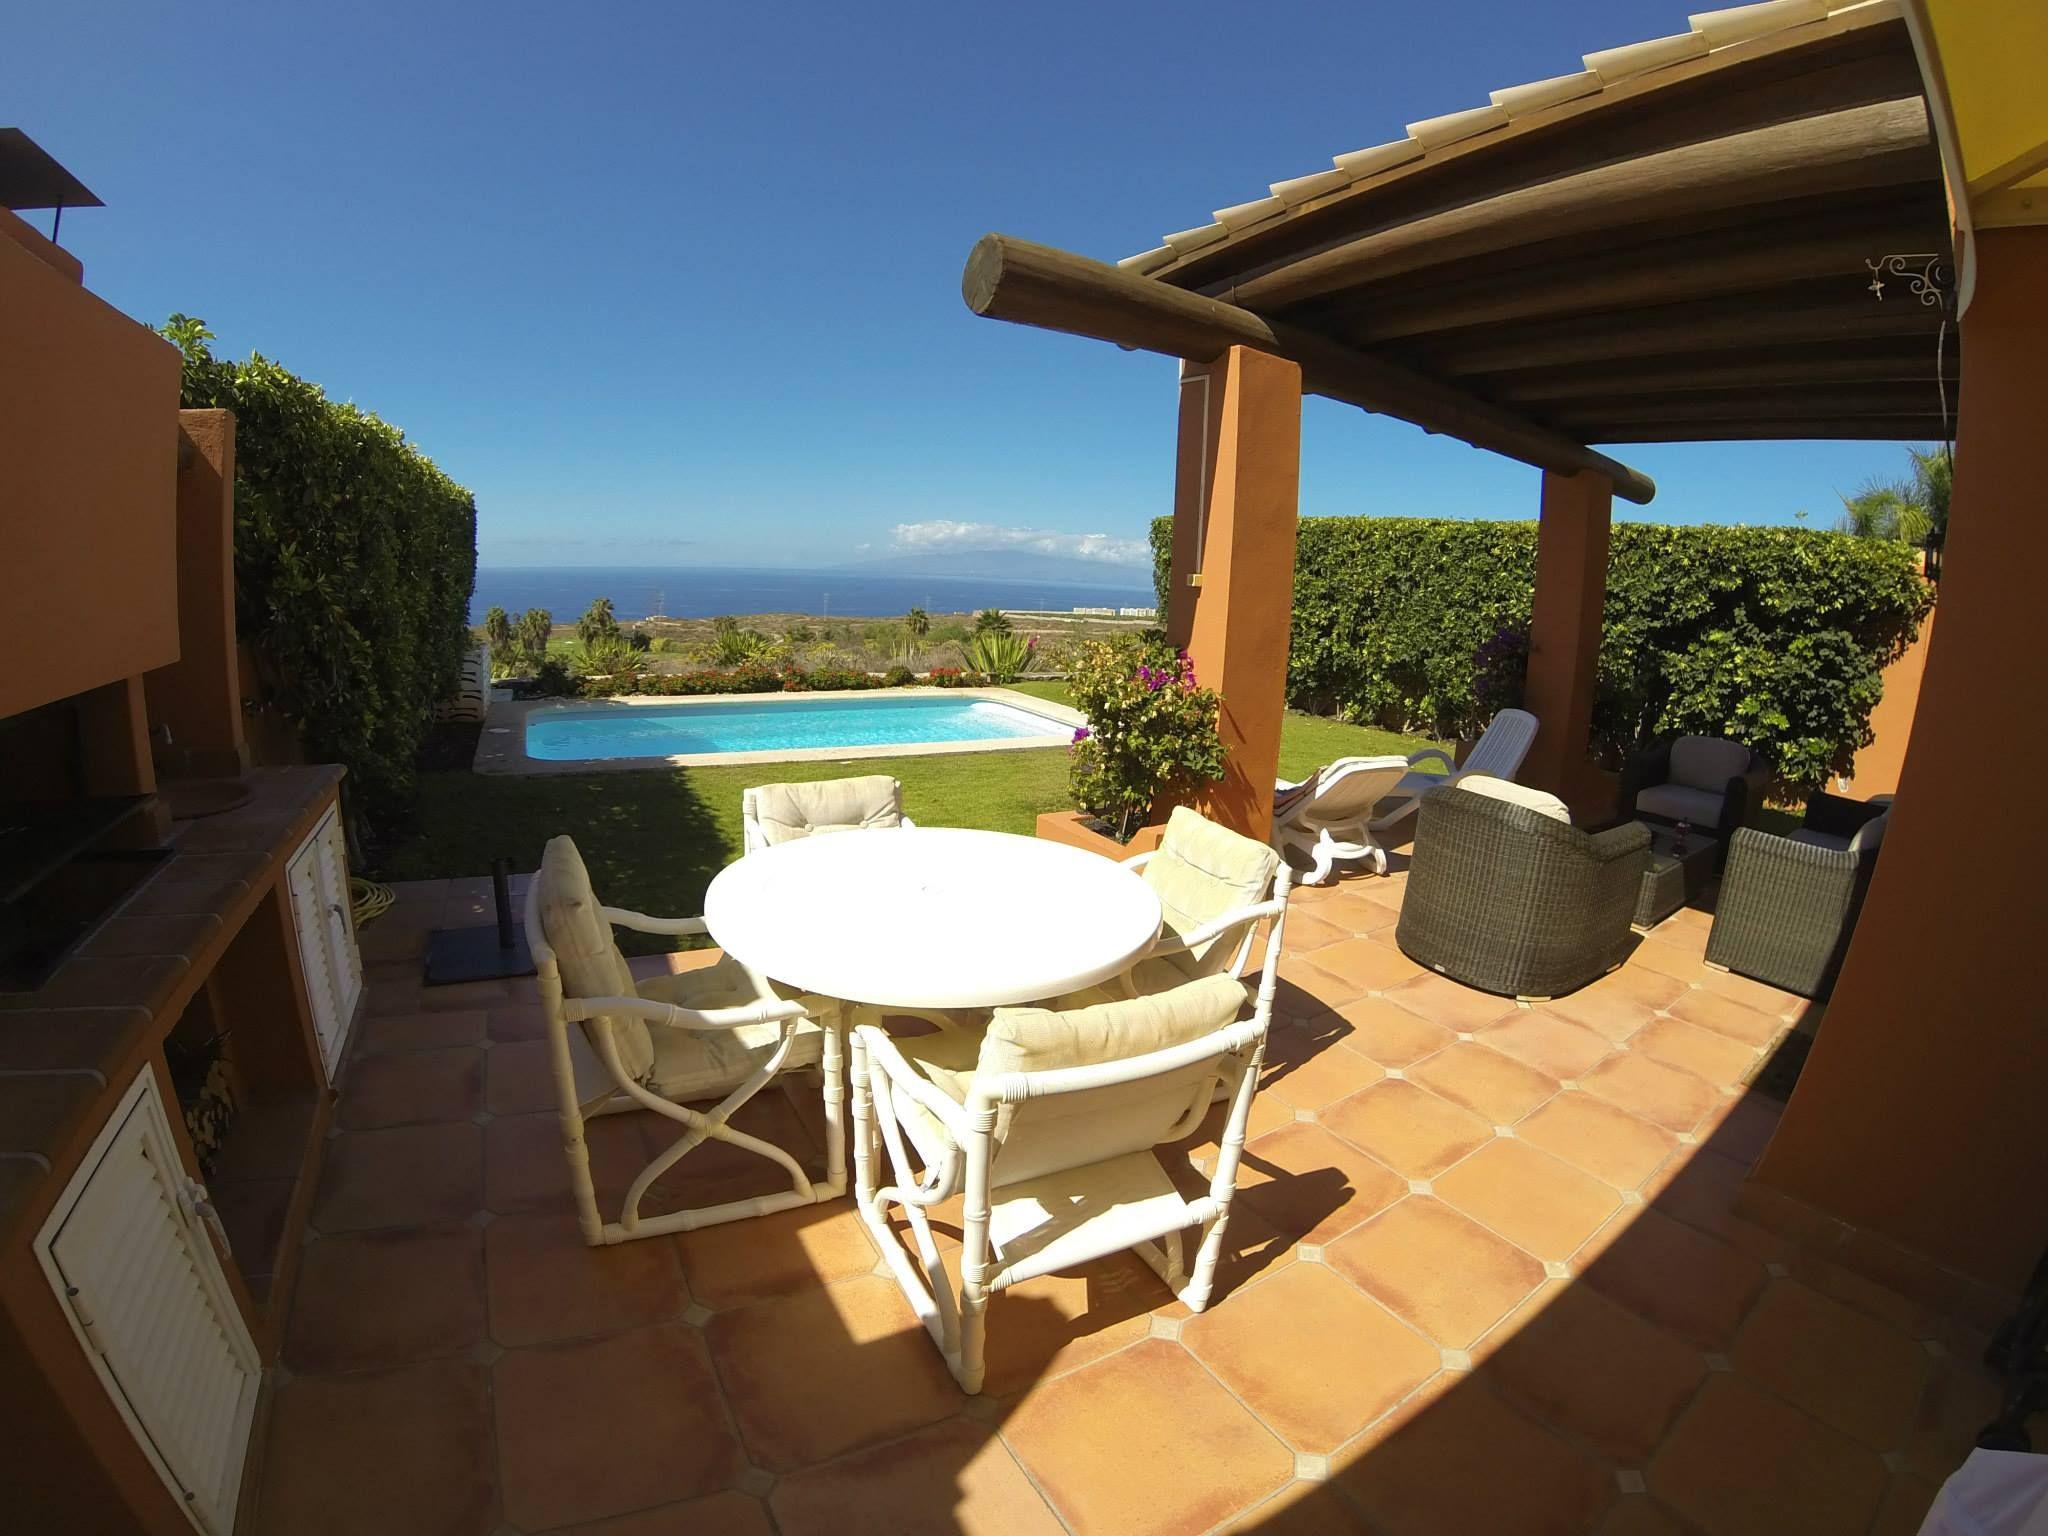 Inmobiliaria experta en viviendas de lujo en Tenerife